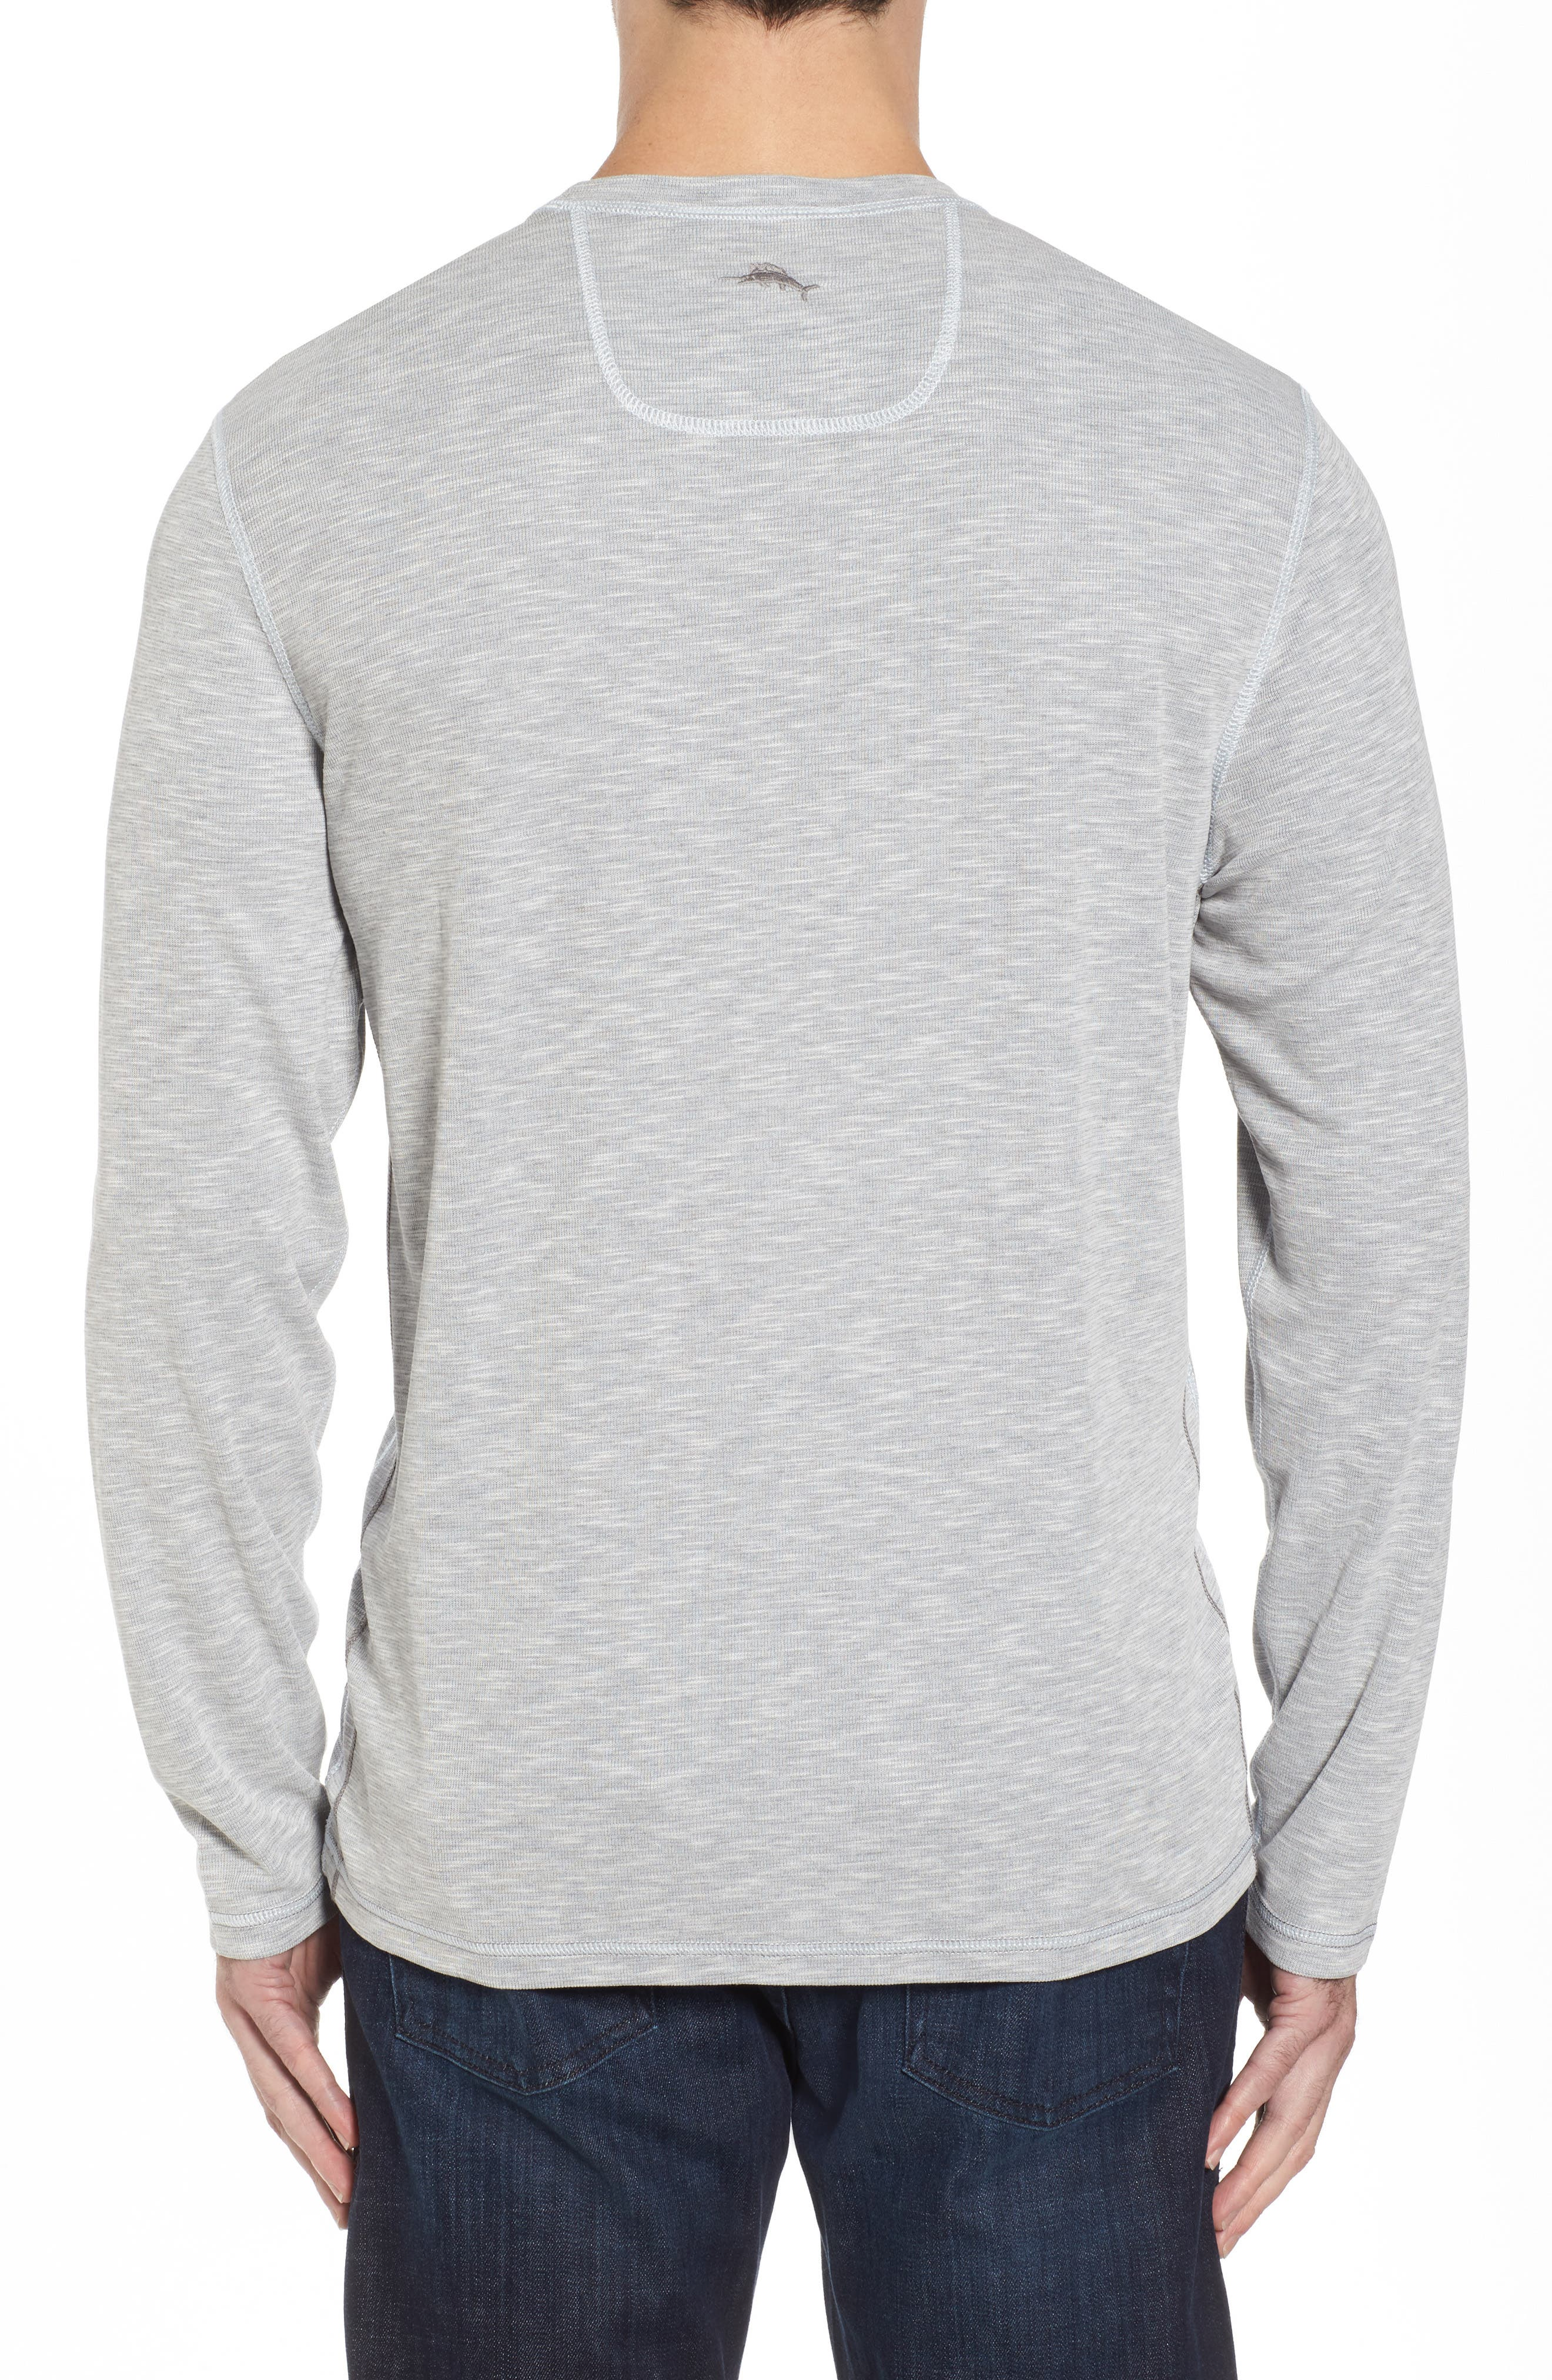 Alternate Image 3  - Tommy Bahama Flip Tide Long Sleeve T-Shirt